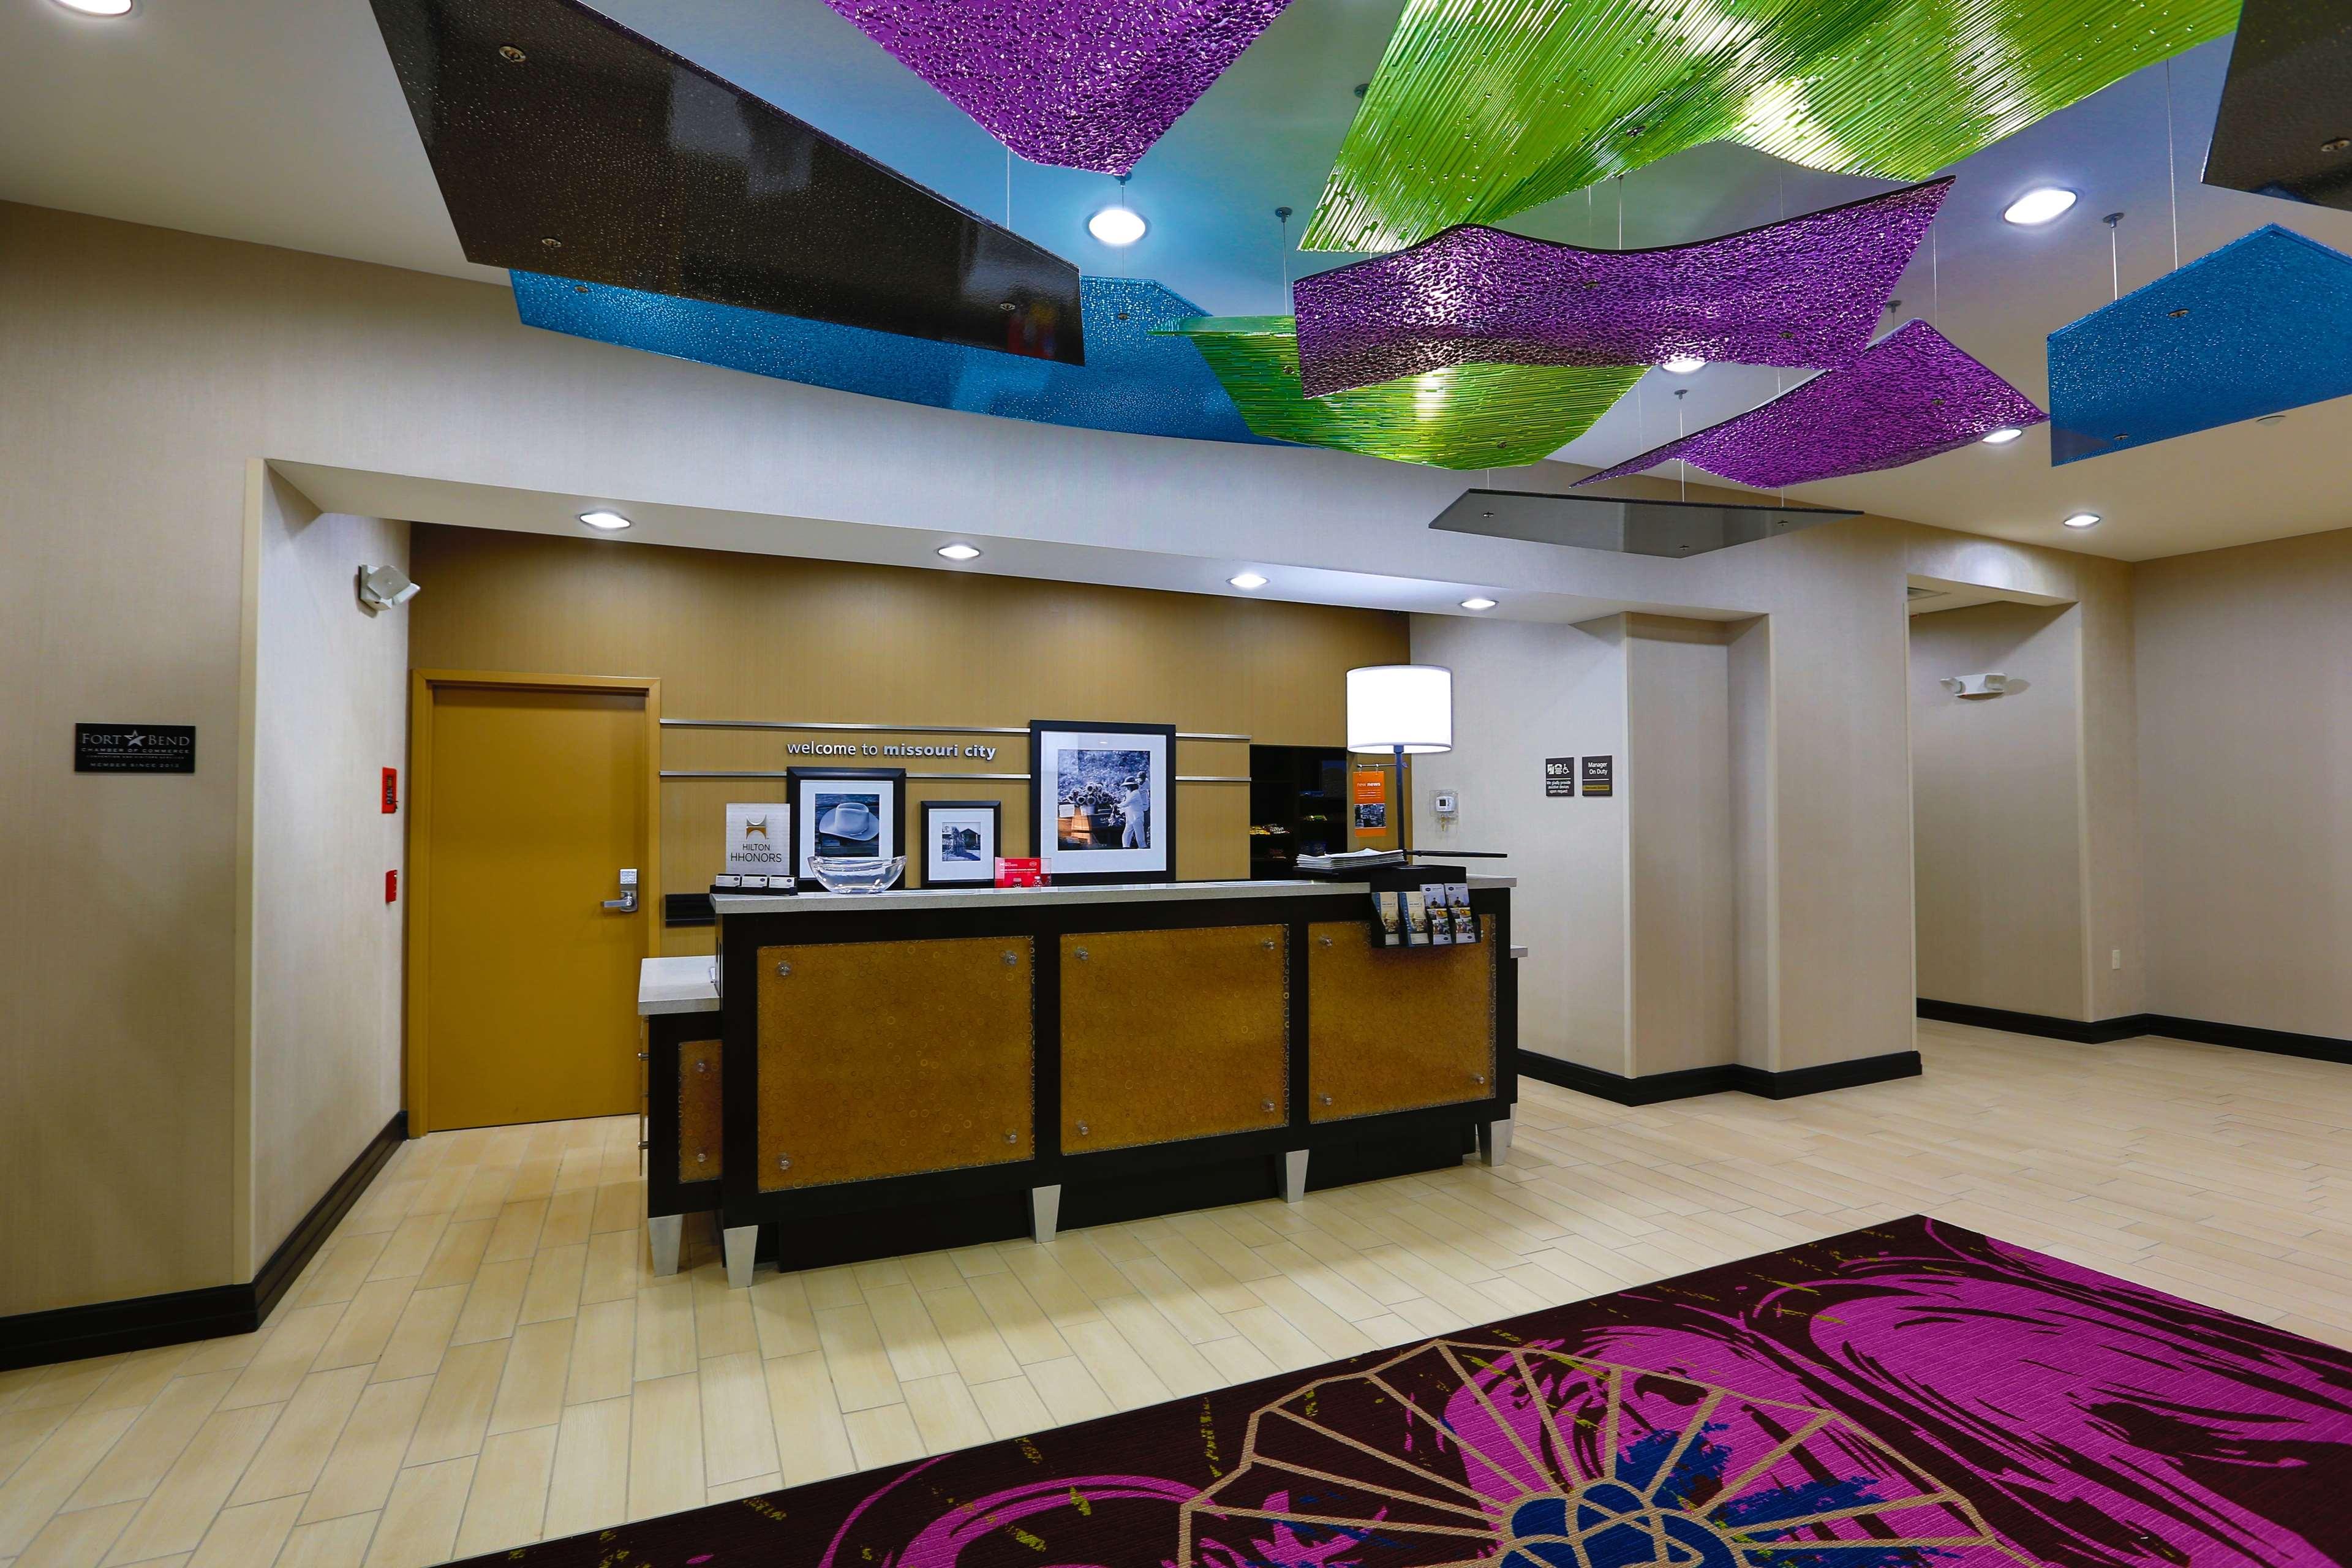 Hampton Inn & Suites Missouri City, TX image 11